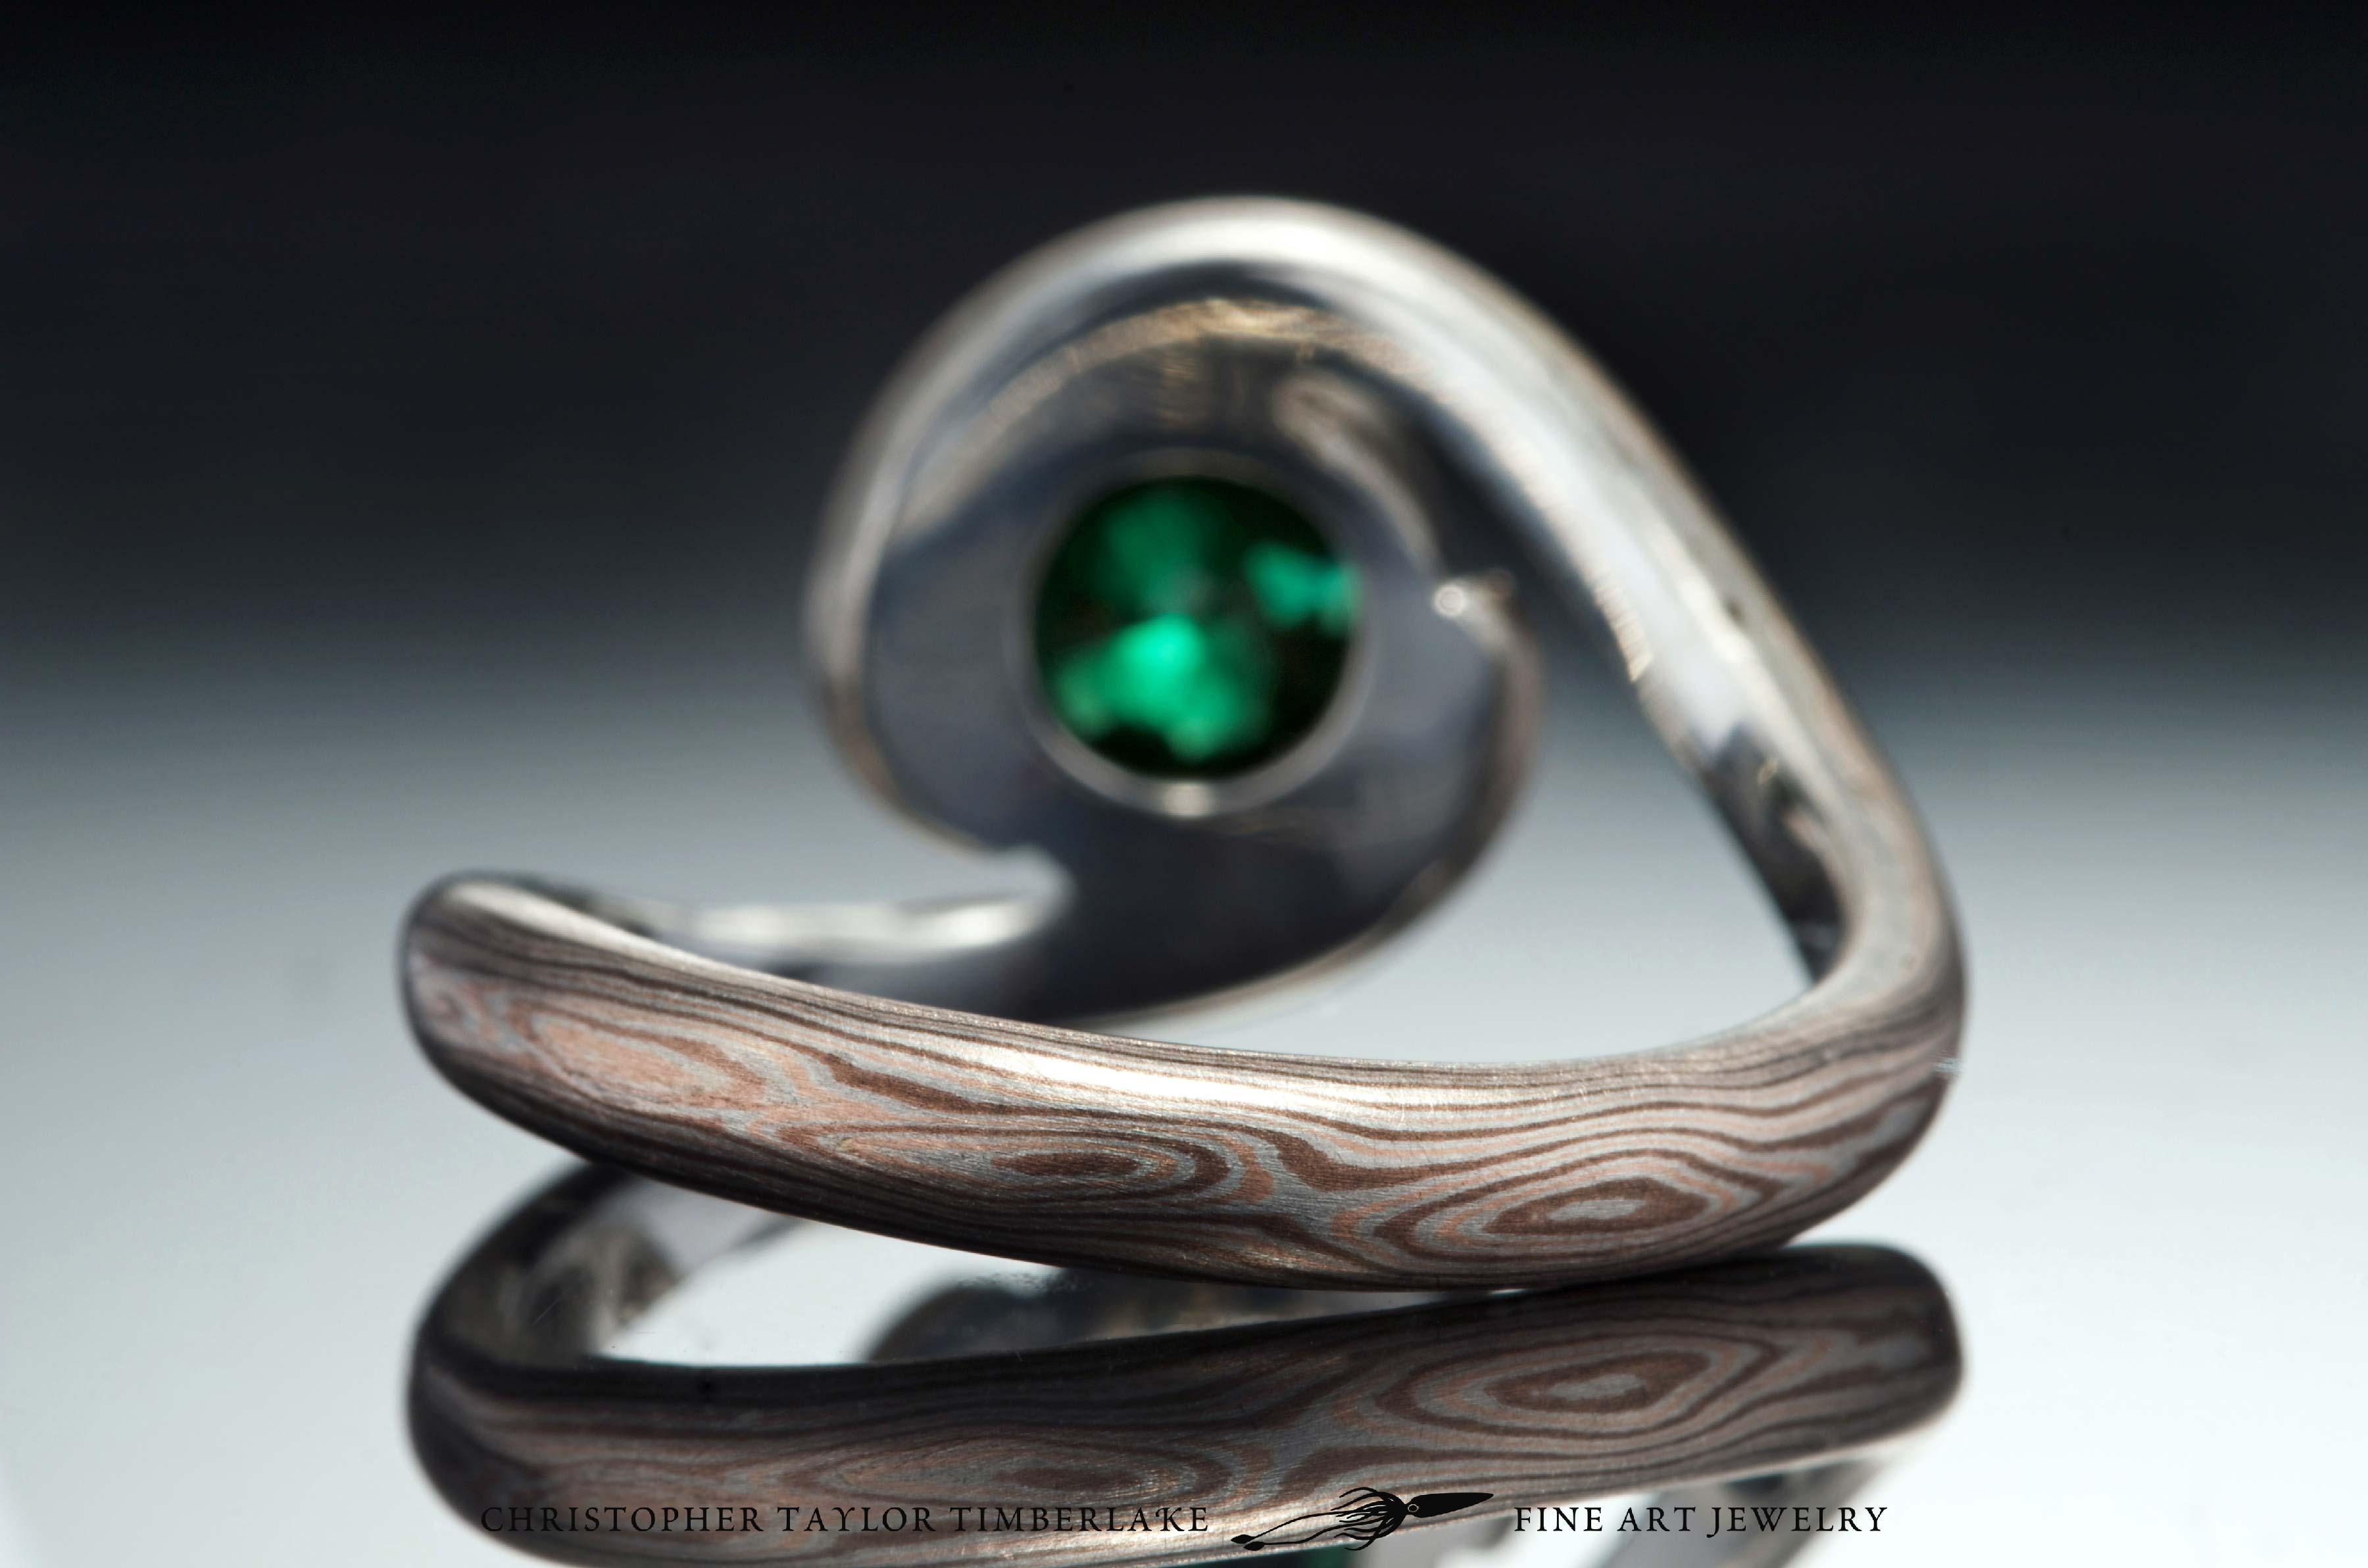 Mokume-(m81)-14-Karat-rose-gold,-shakudo-(2K),-and-sterling-silver-with-Palladium-and-6,31mm-modified-rose-cut-round-chrome-green-tourmaline-4